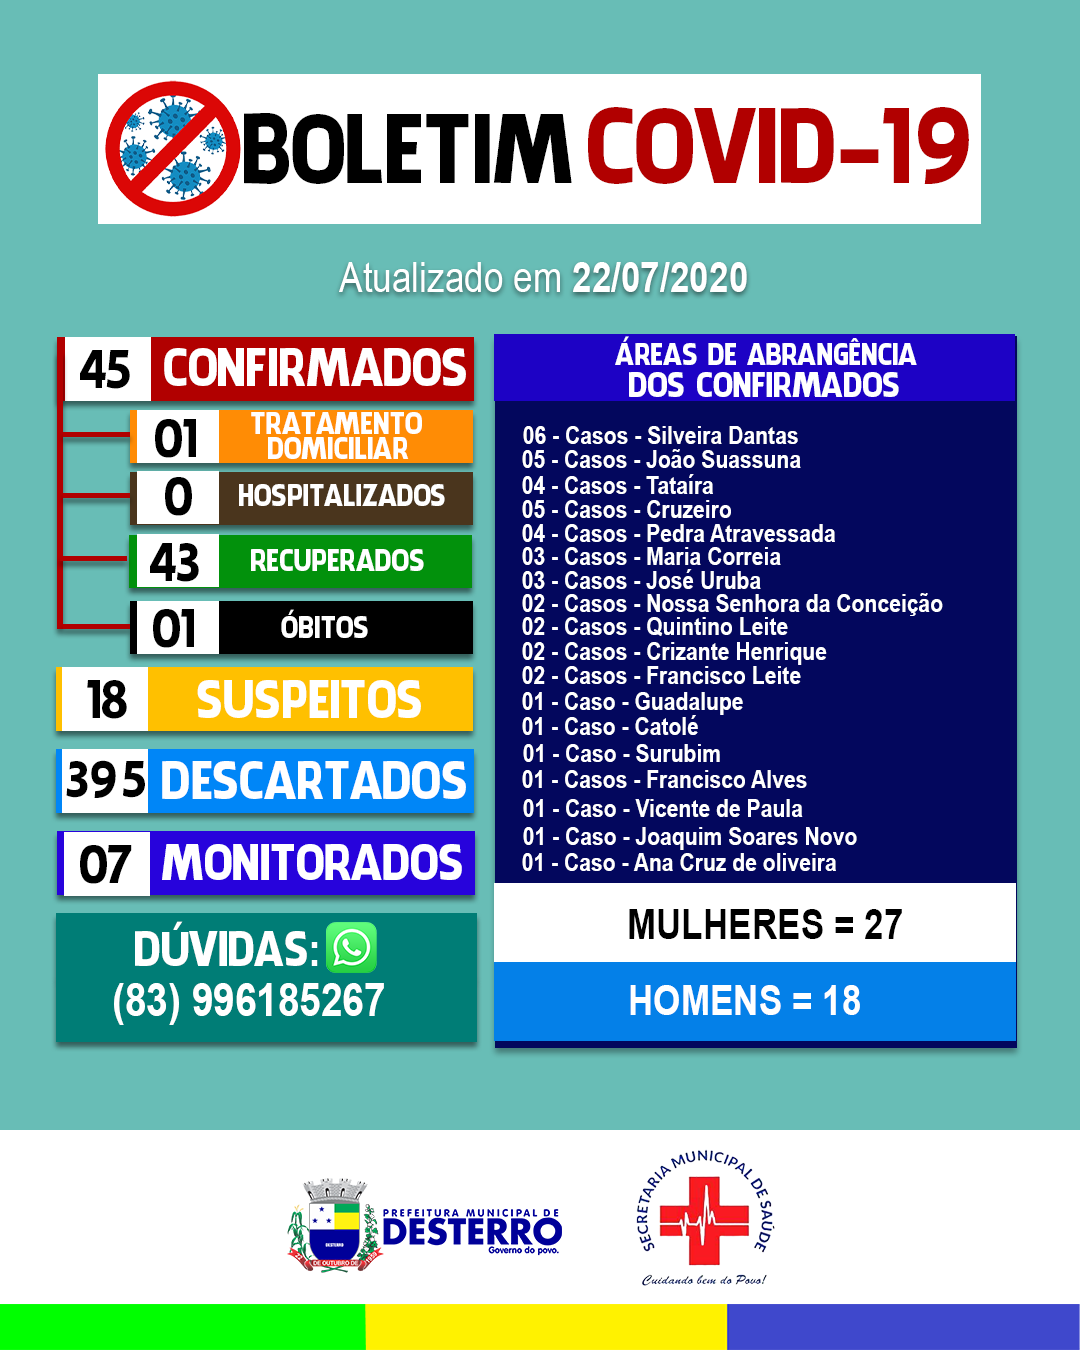 Boletim Covid-19 (22/07/2020)